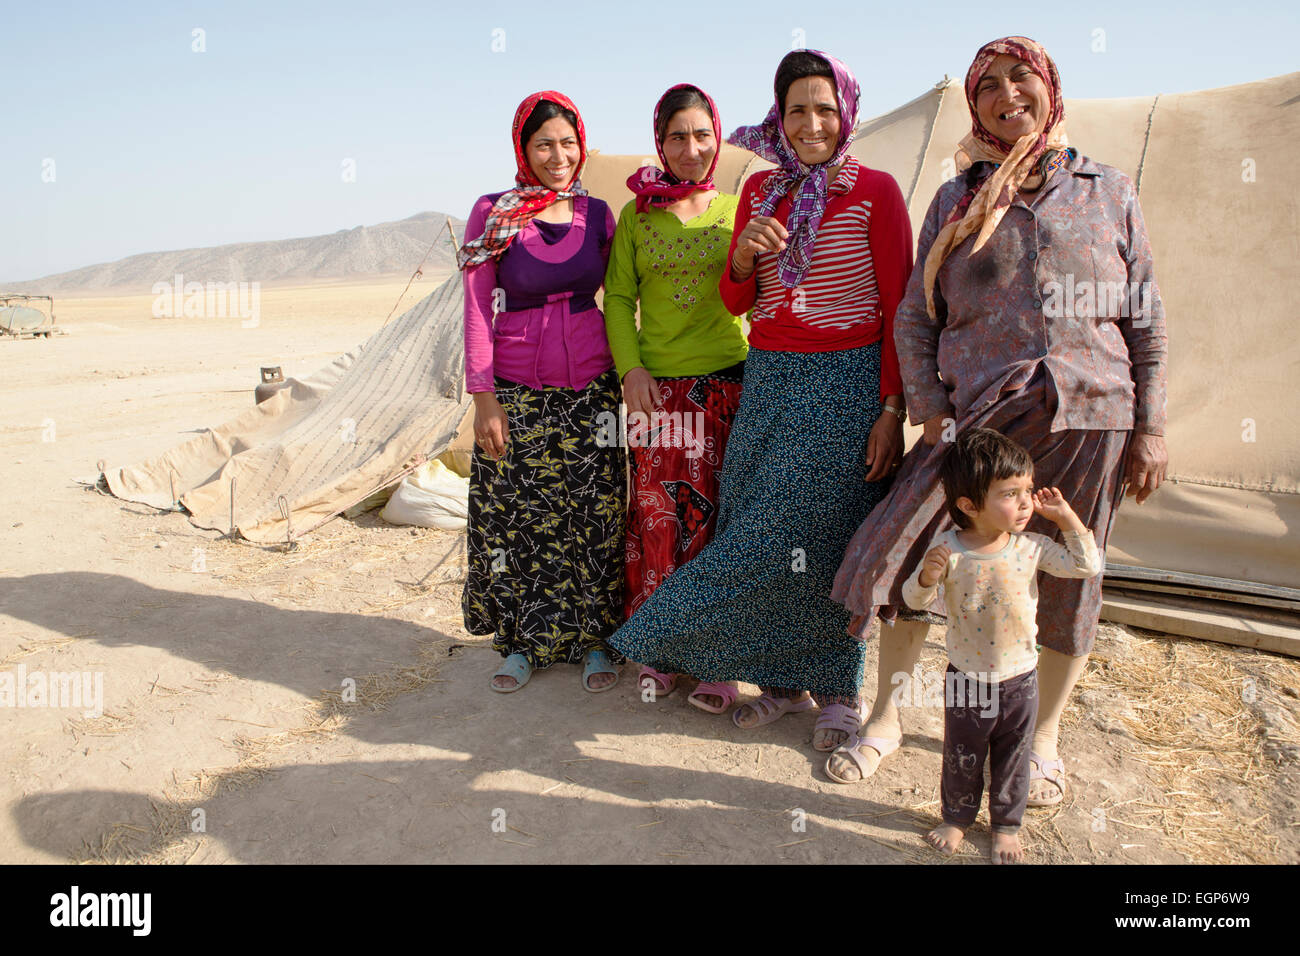 Los indígenas nómadas Golestán Park, Irán Imagen De Stock